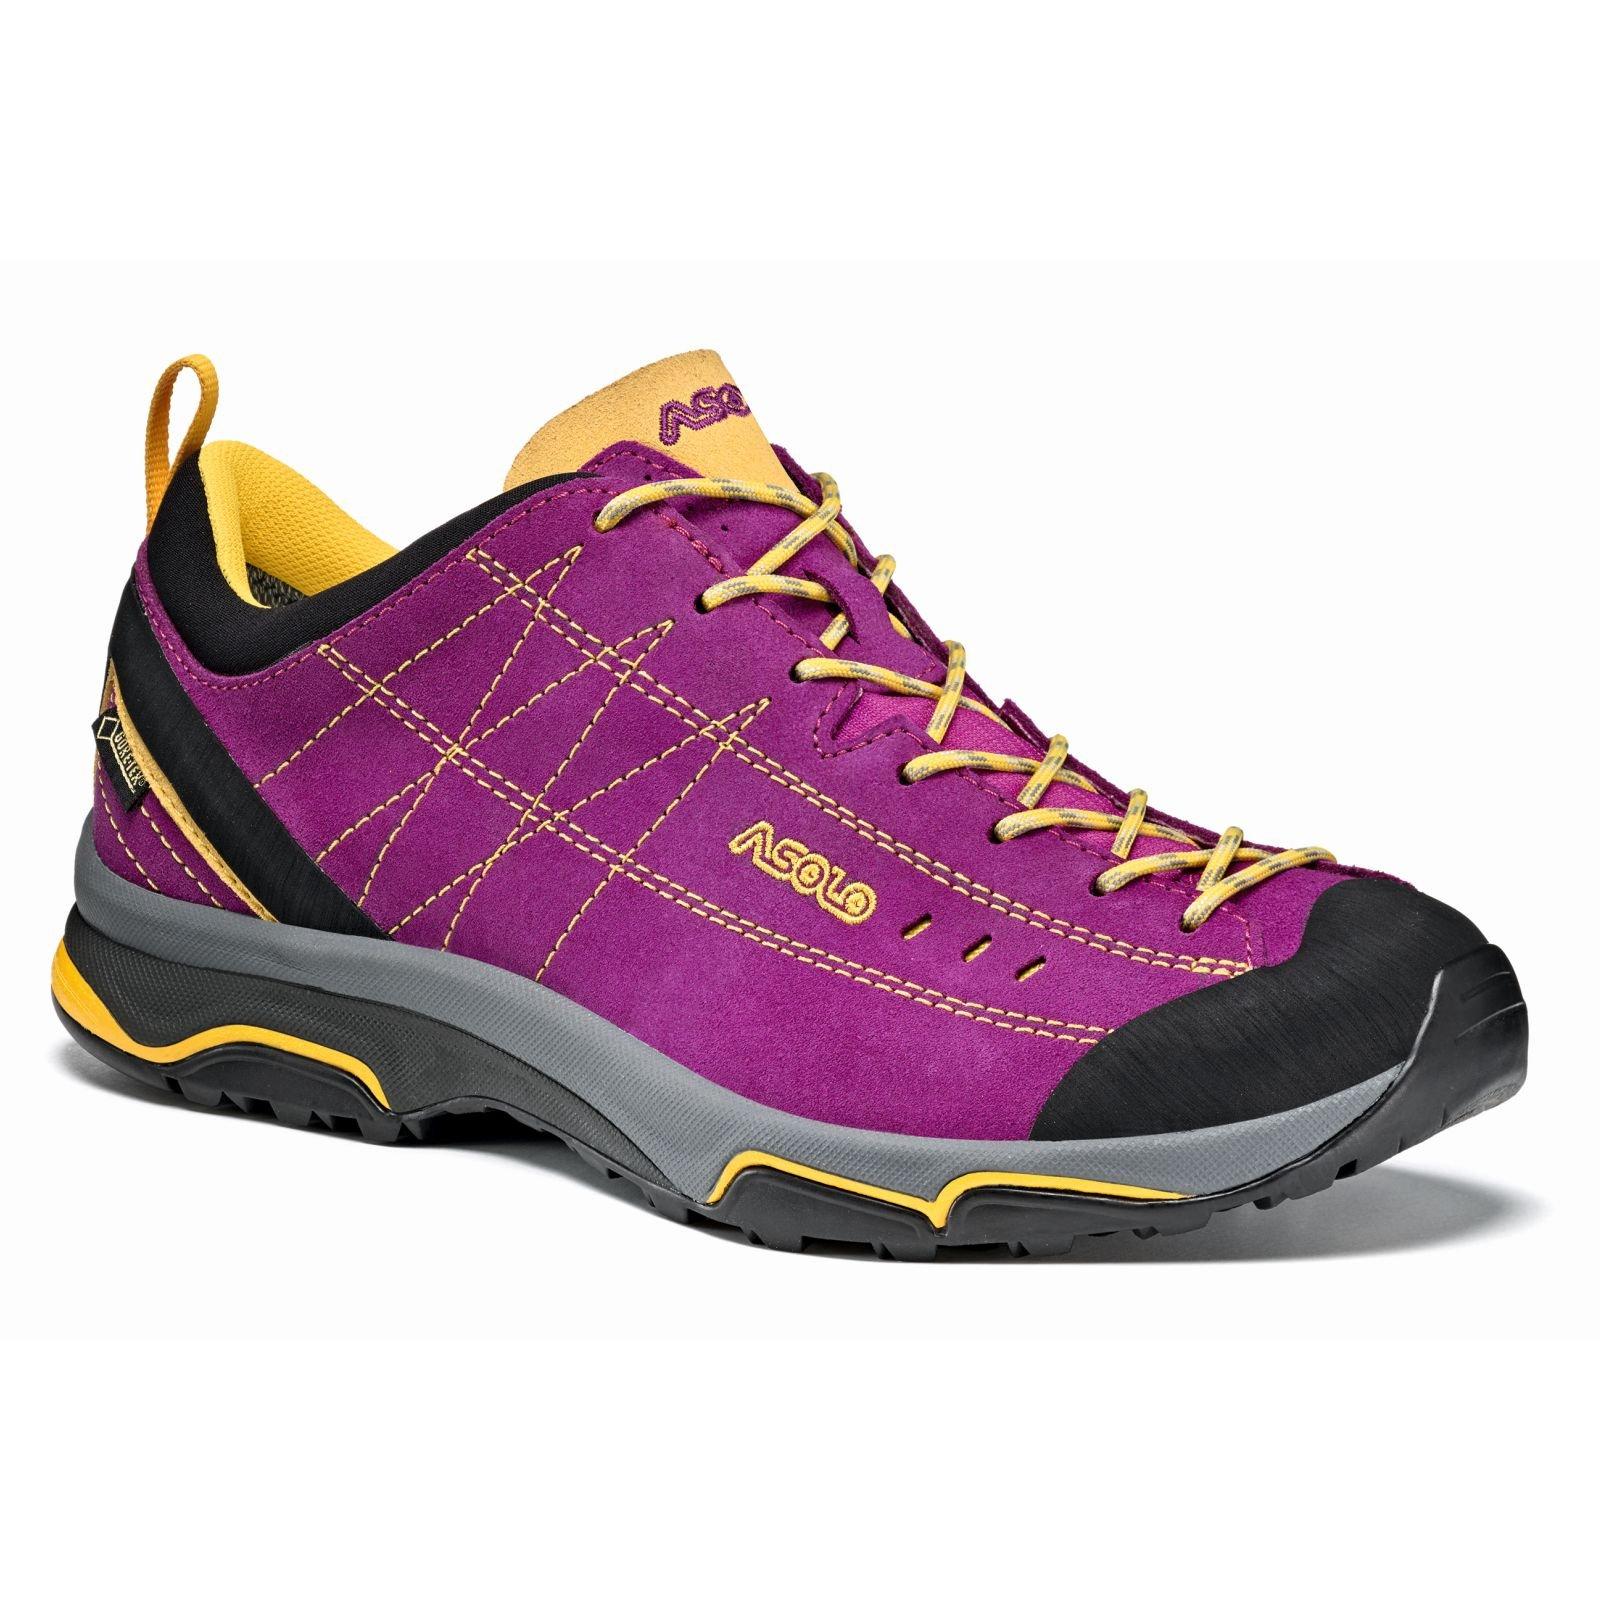 Asolo Women's Nucleon GV Hiking Shoe Verbena/Yellow - 7 by Asolo (Image #1)